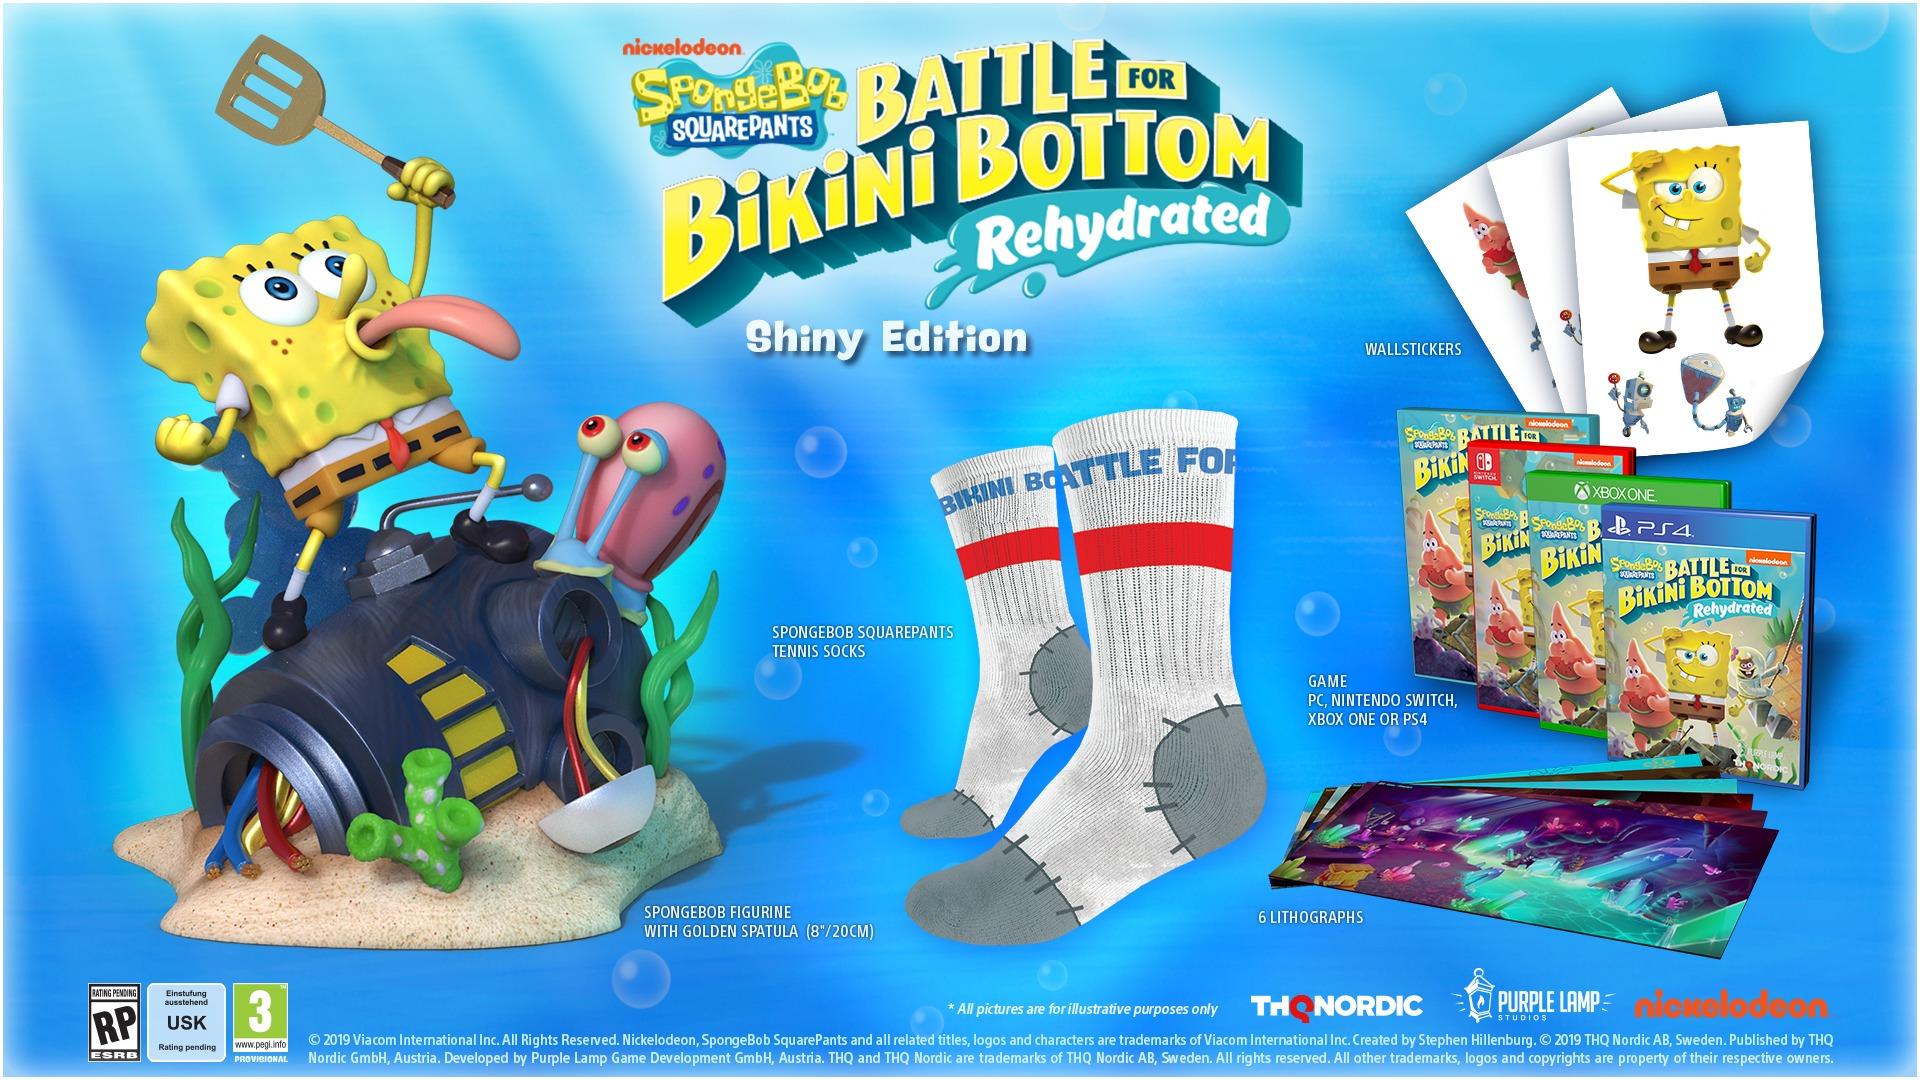 Spongebob SquarePants: Battle for Bikini Bottom - Fun Edition